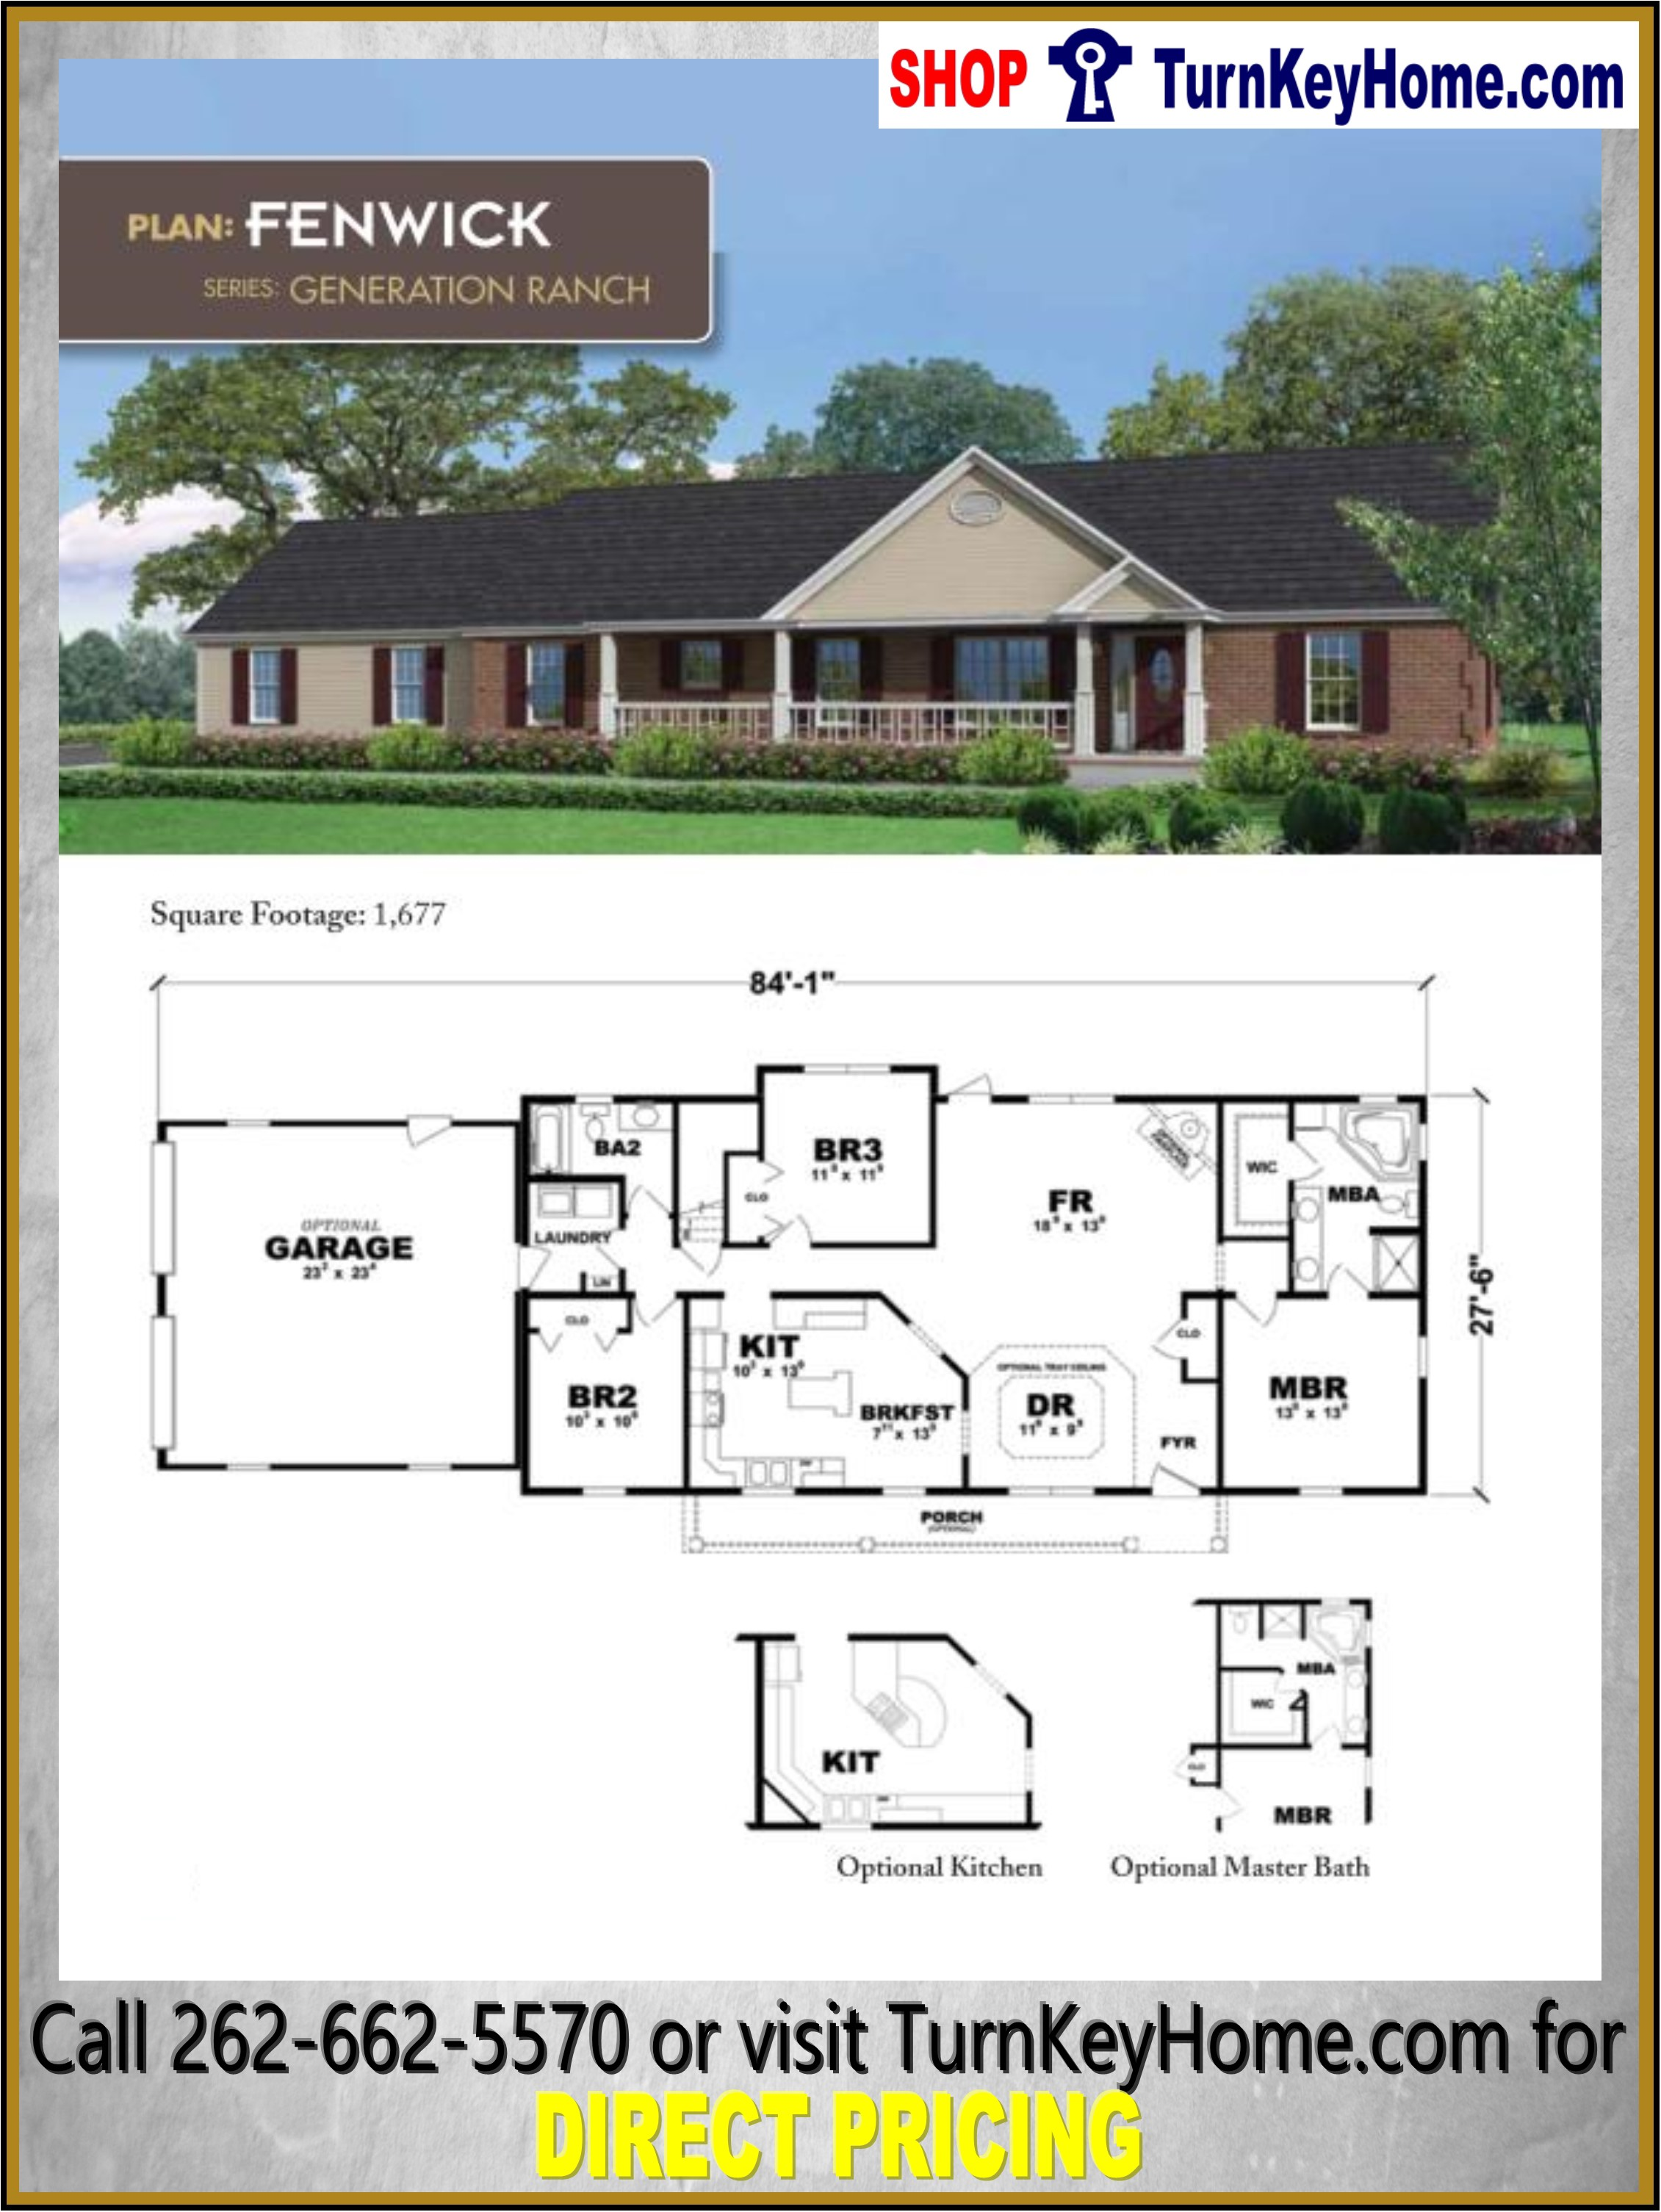 FENWICK Ranch Style Home 3 Bed 2 Bath Plan 1677 SF Priced ... on 3-bedroom ranch homes, 3-bedroom ranch style house plans, house plans with 5 bedrooms and 3 bathrooms,